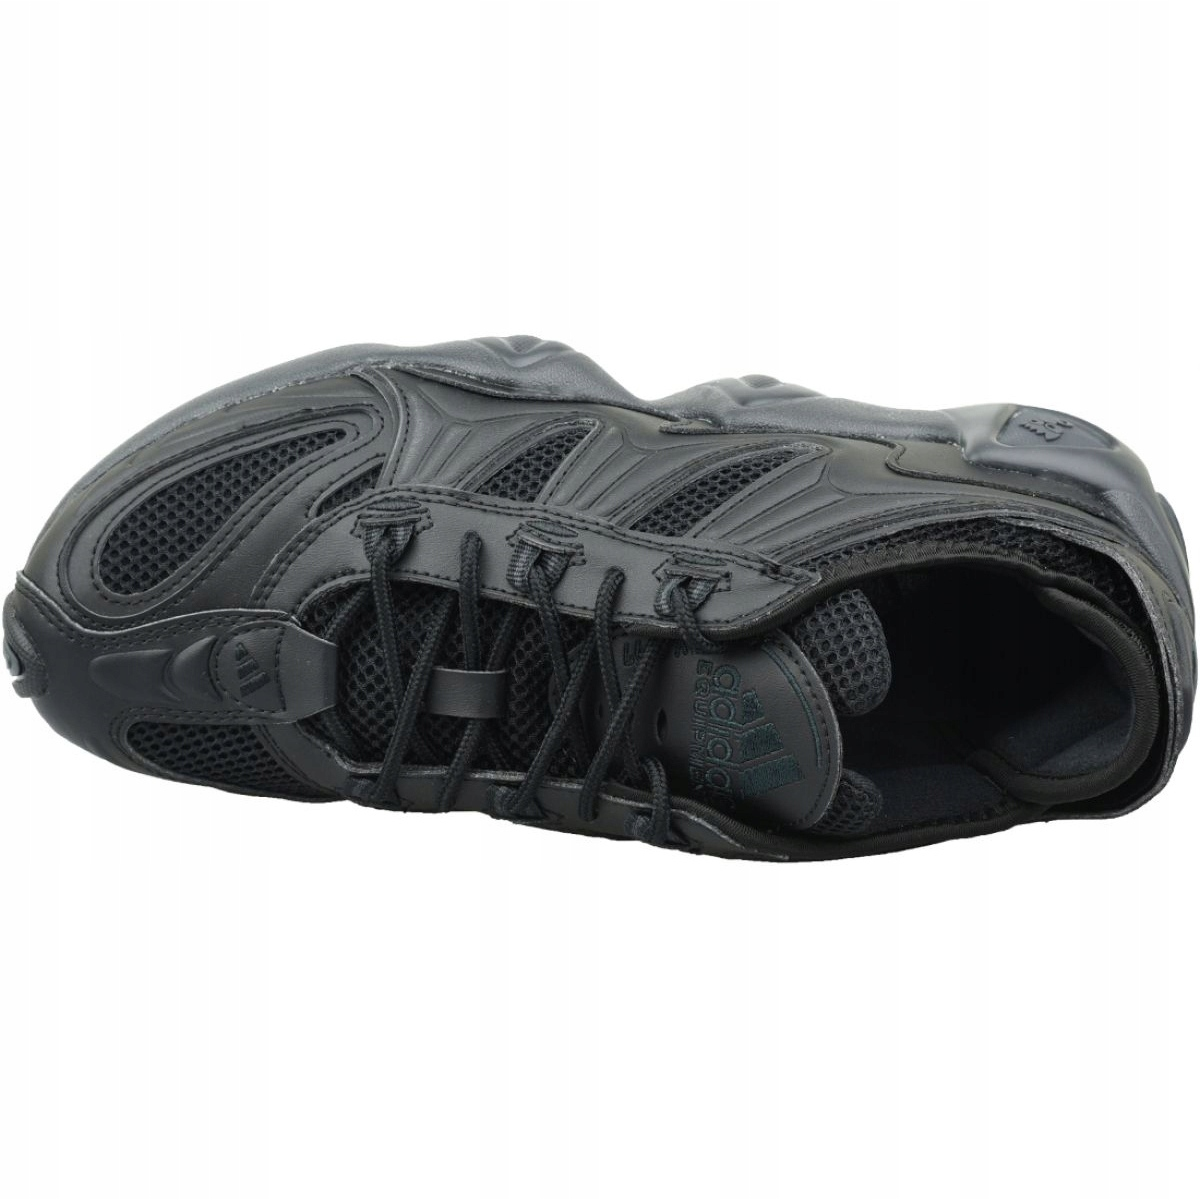 Adidas Fyw S 97 M EE5309 skor svart